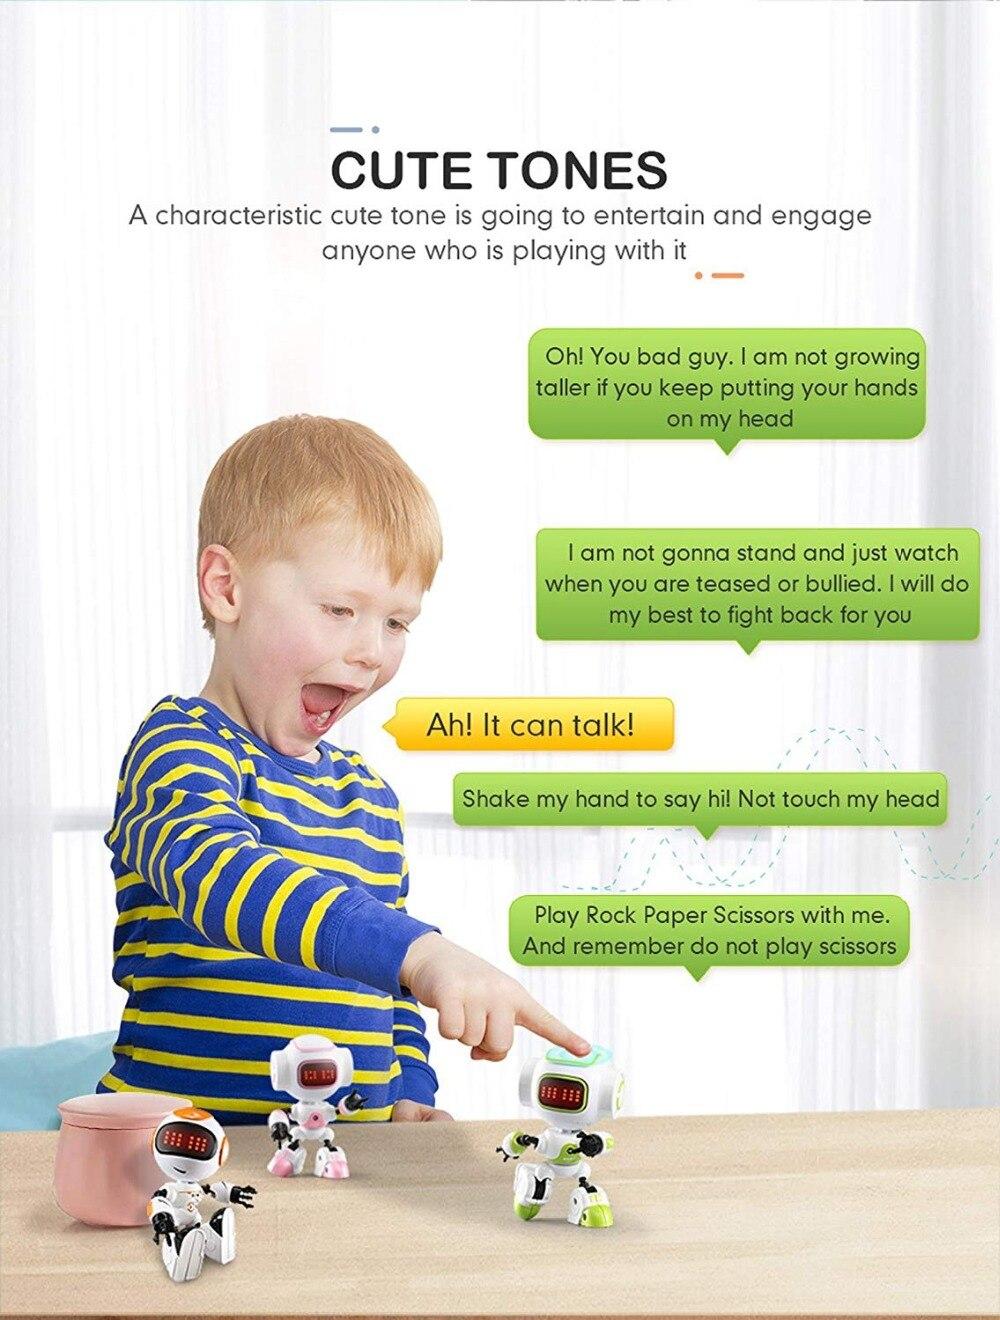 JJRC R8 LUKE Intelligent Robot Touch Control DIY Gesture Talk Smart Mini RC Robot Gift Toy 21